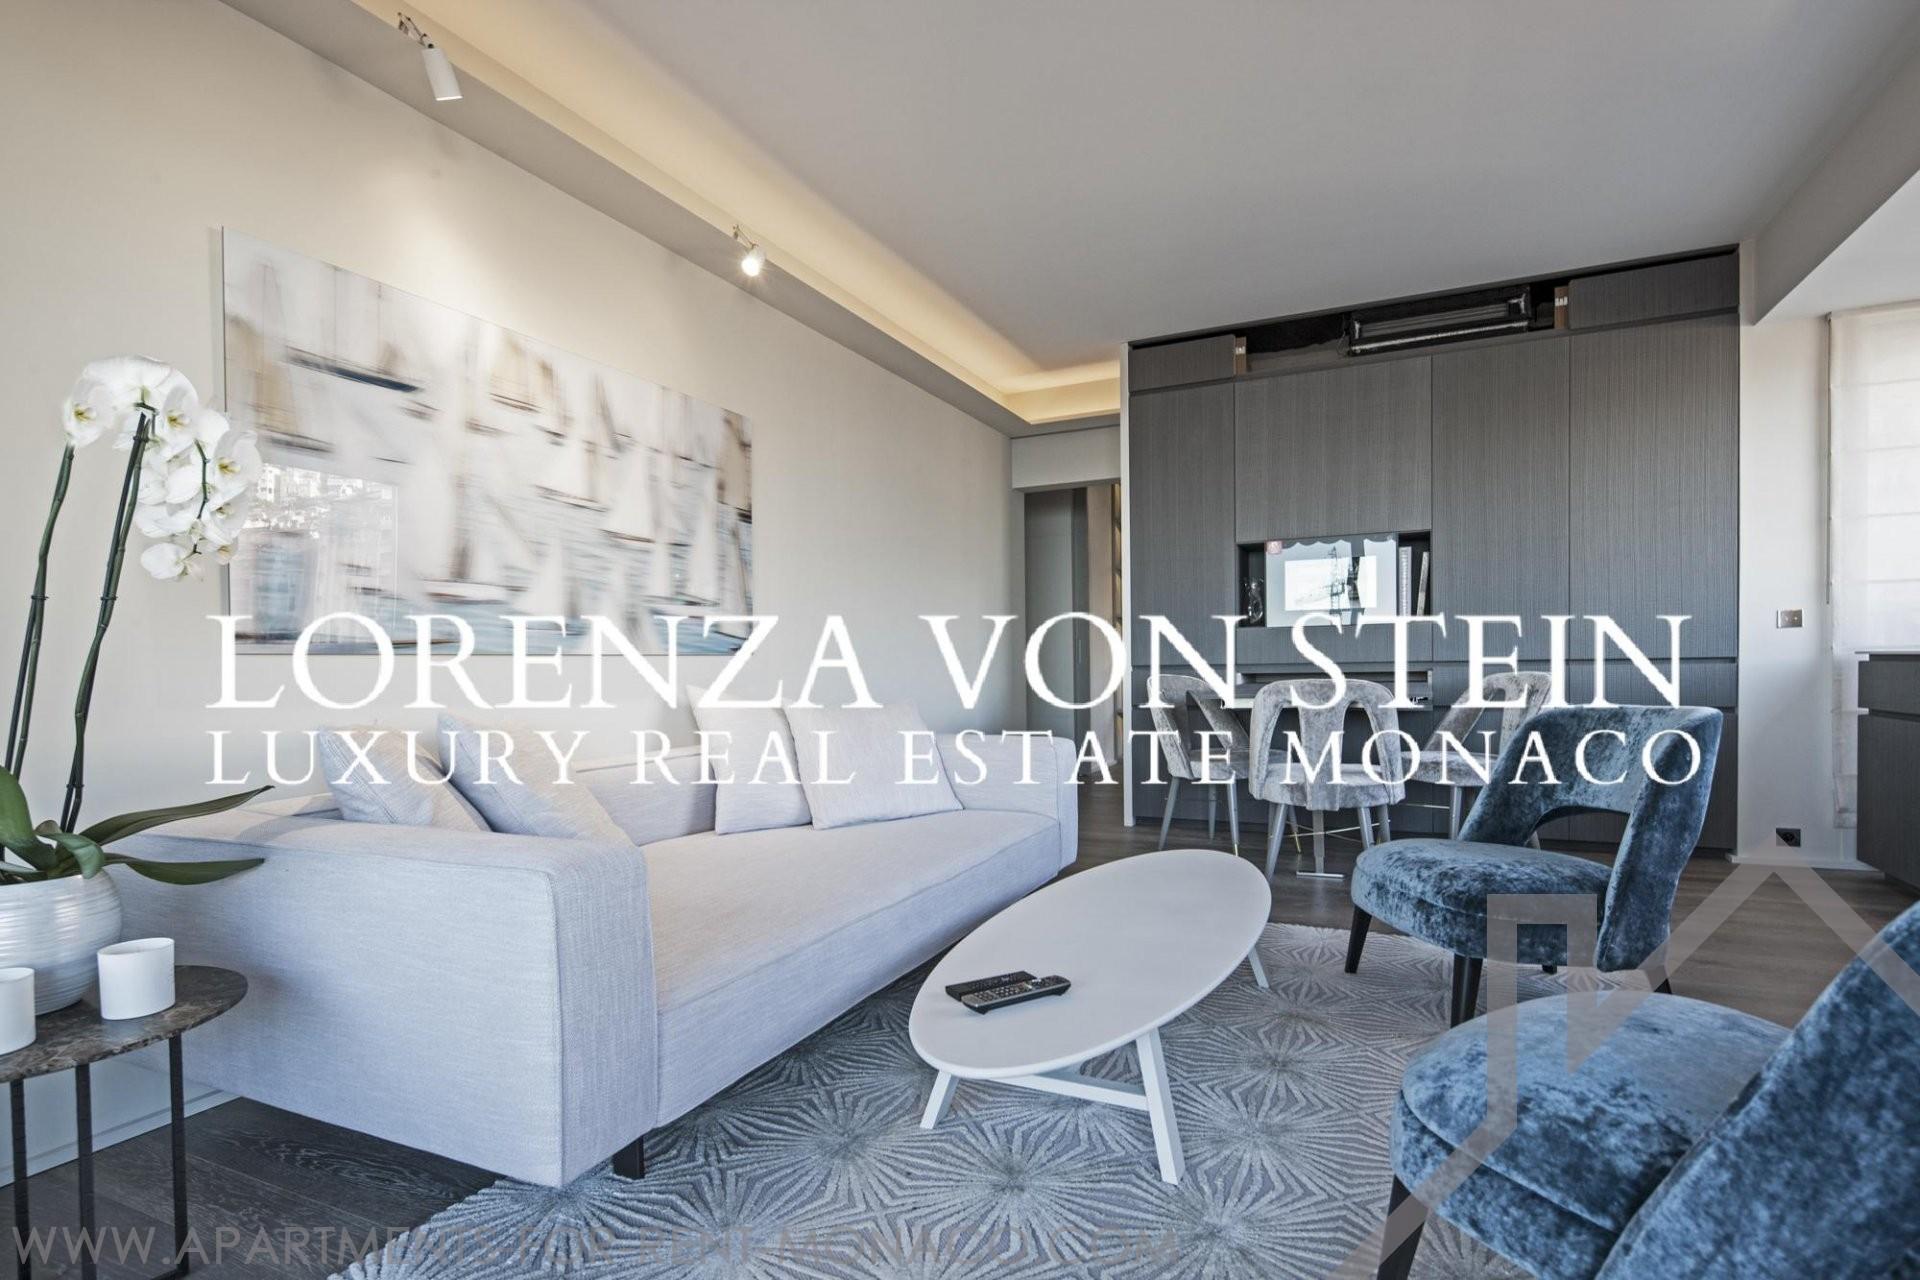 Appartement luxueusement meubl r serv location d - Location d appartement meuble ...